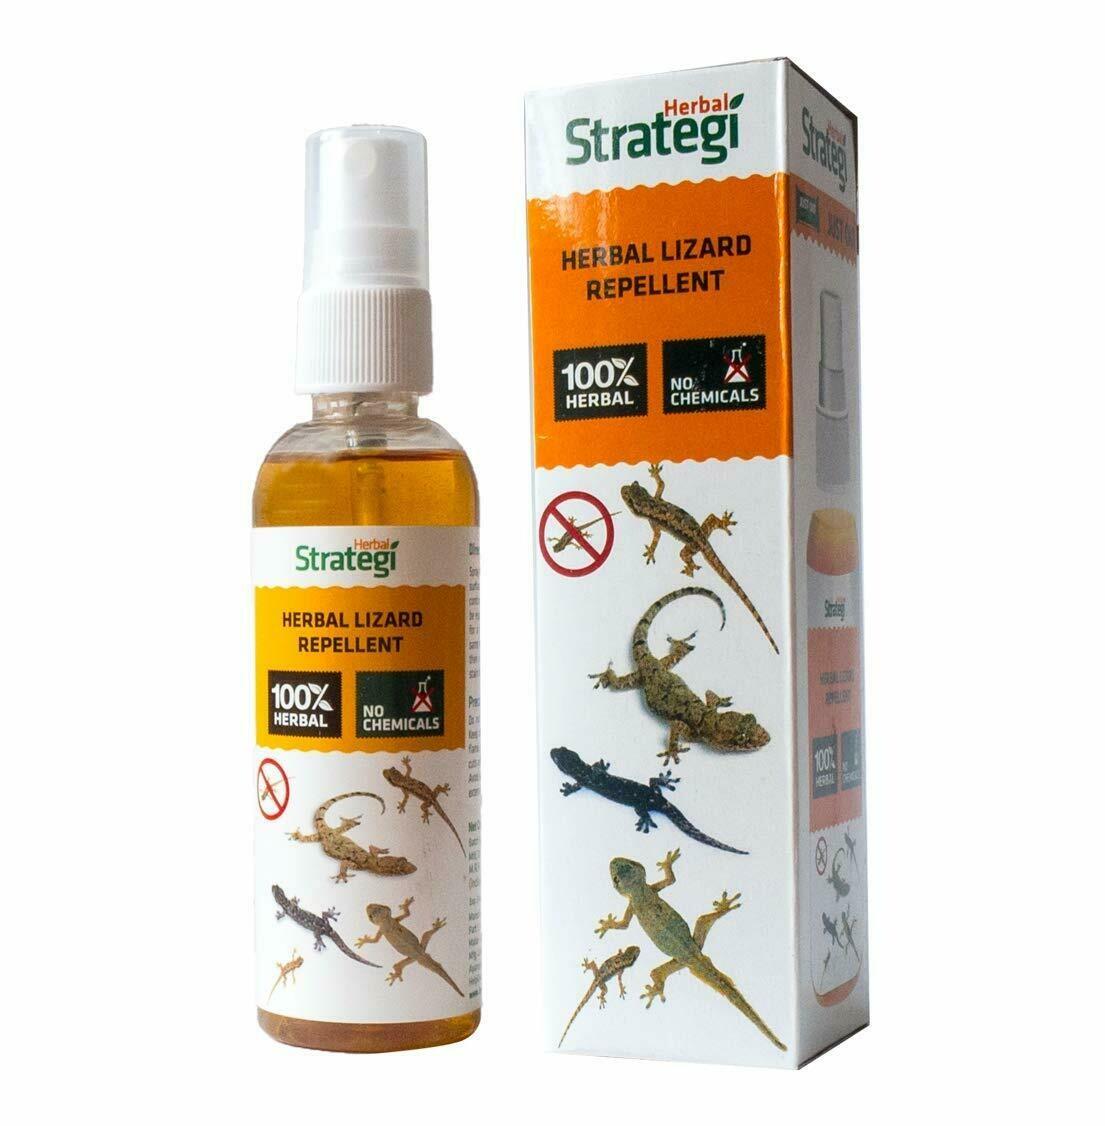 Strategi Herbal Lizard Repellent 100ml